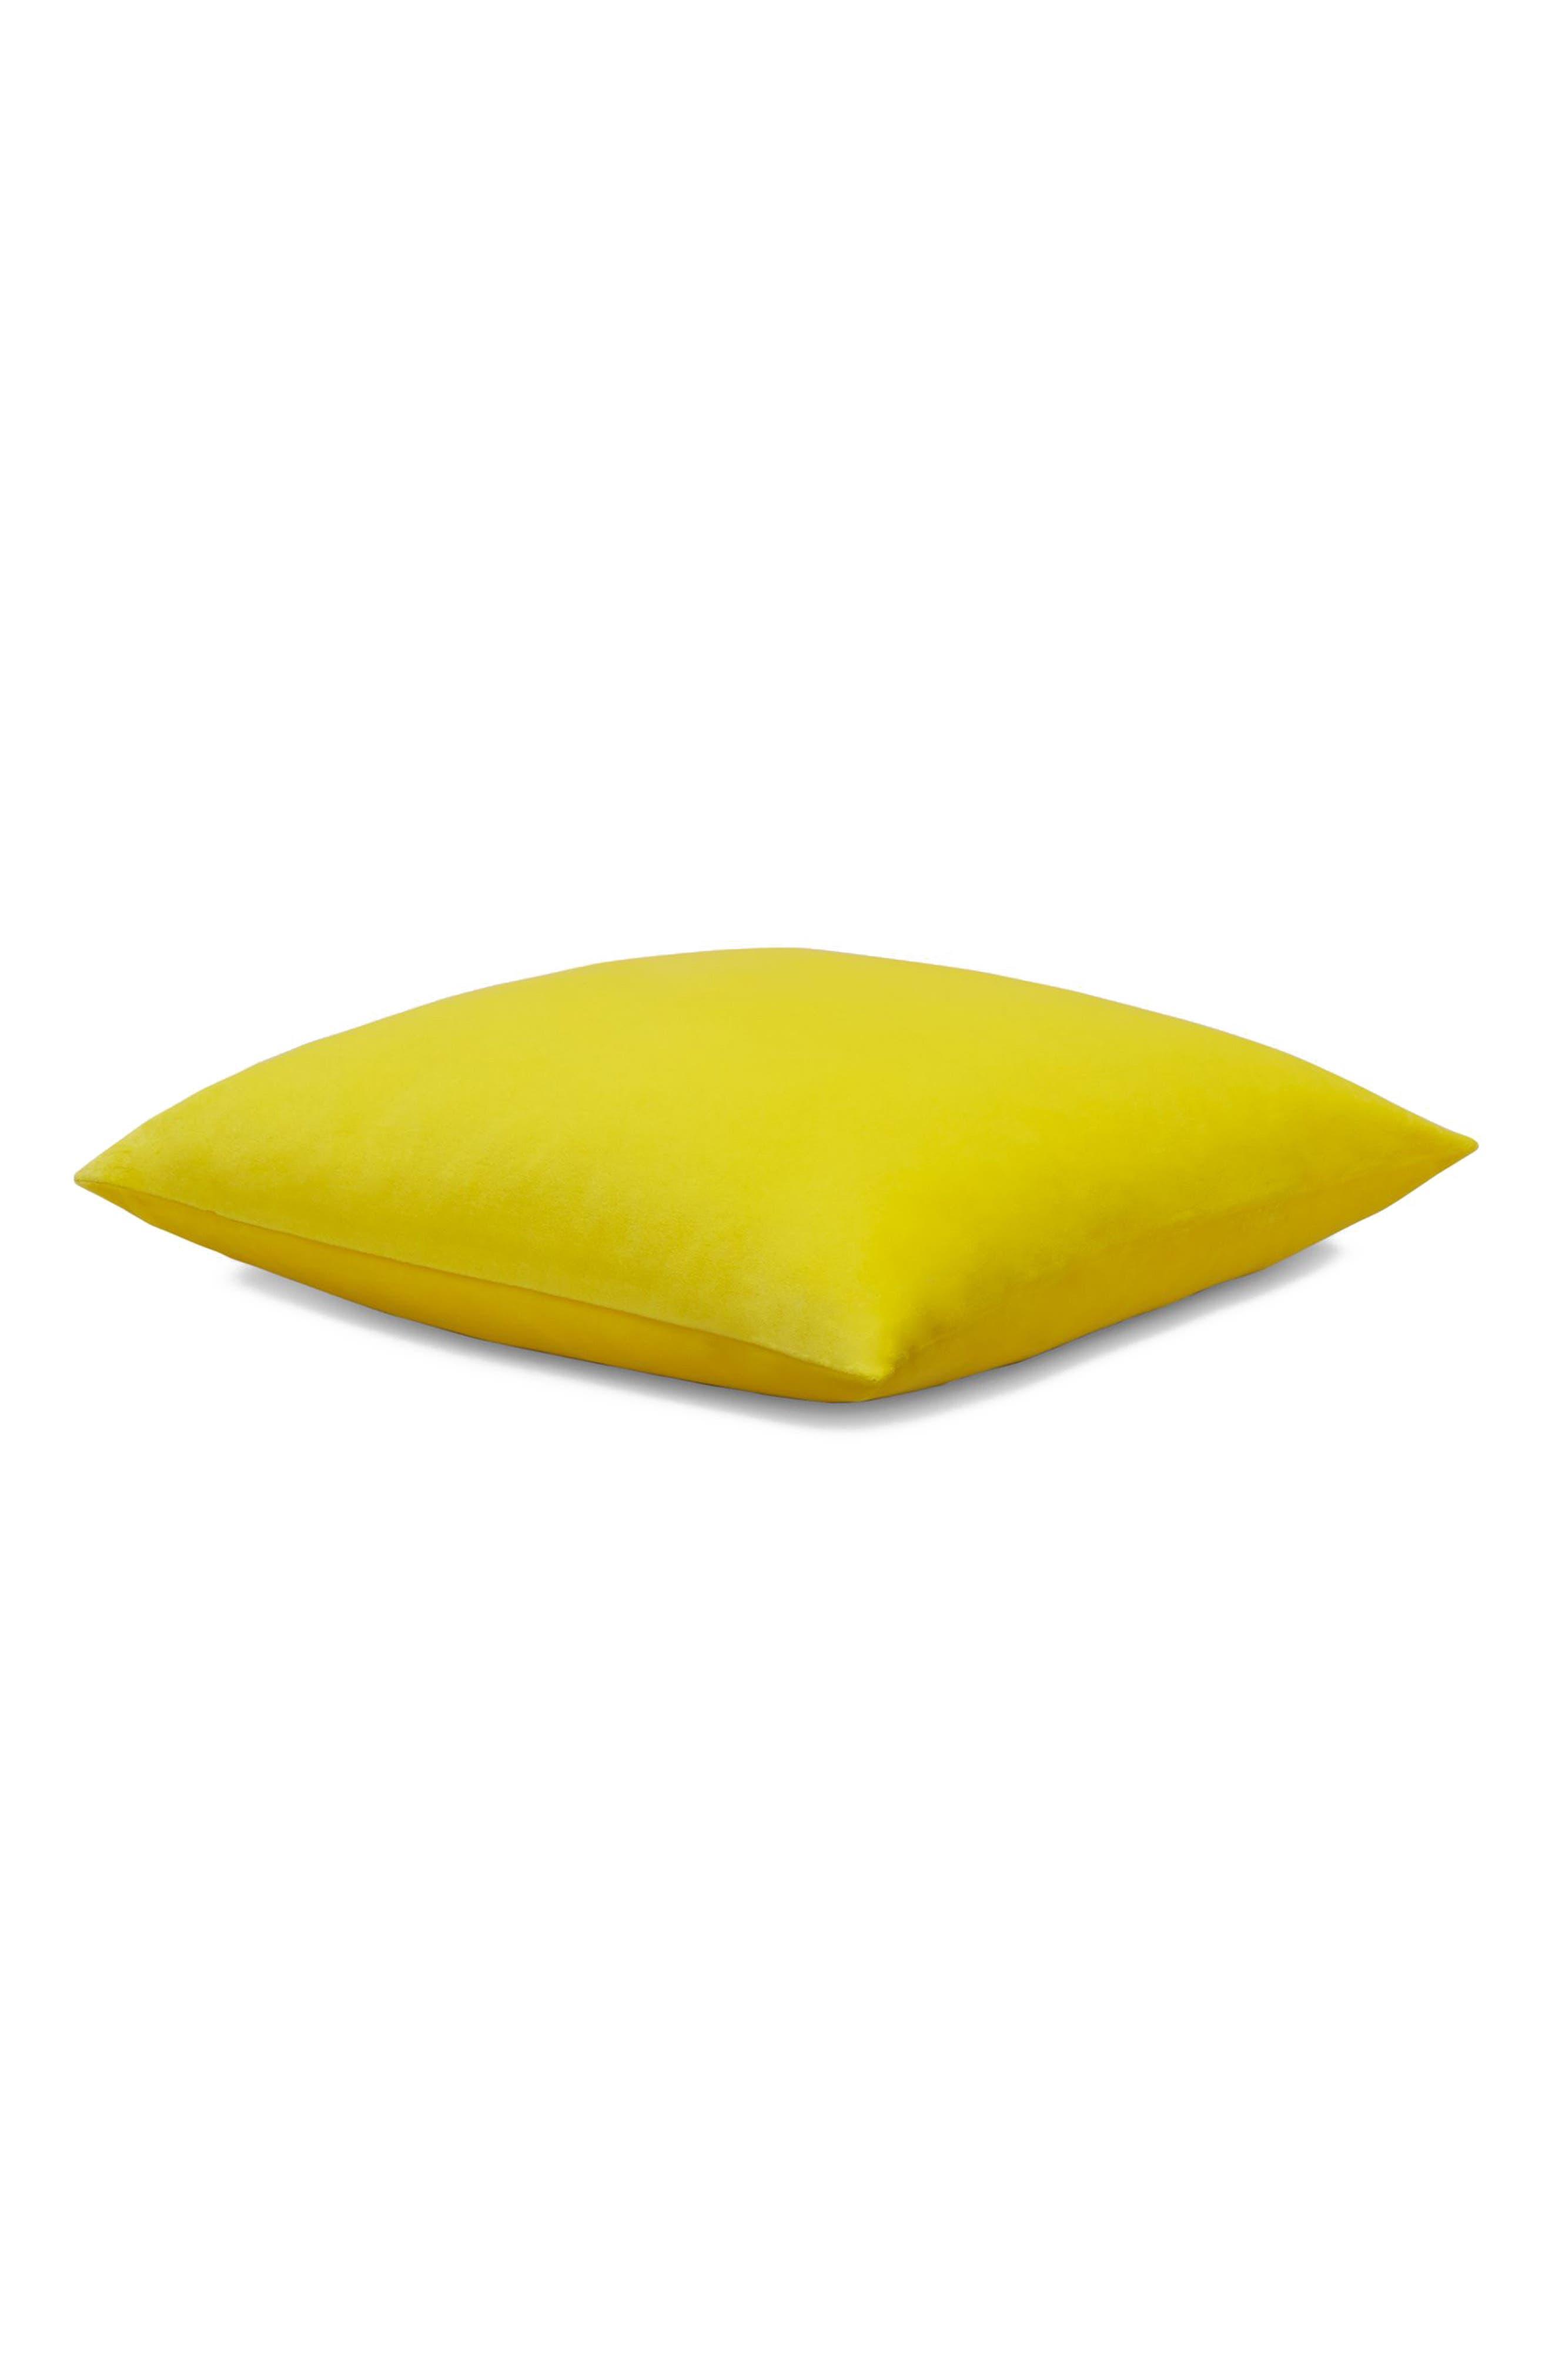 Alternate Image 1 Selected - Calvin Klein Home Lucerne Velvet Accent Pillow